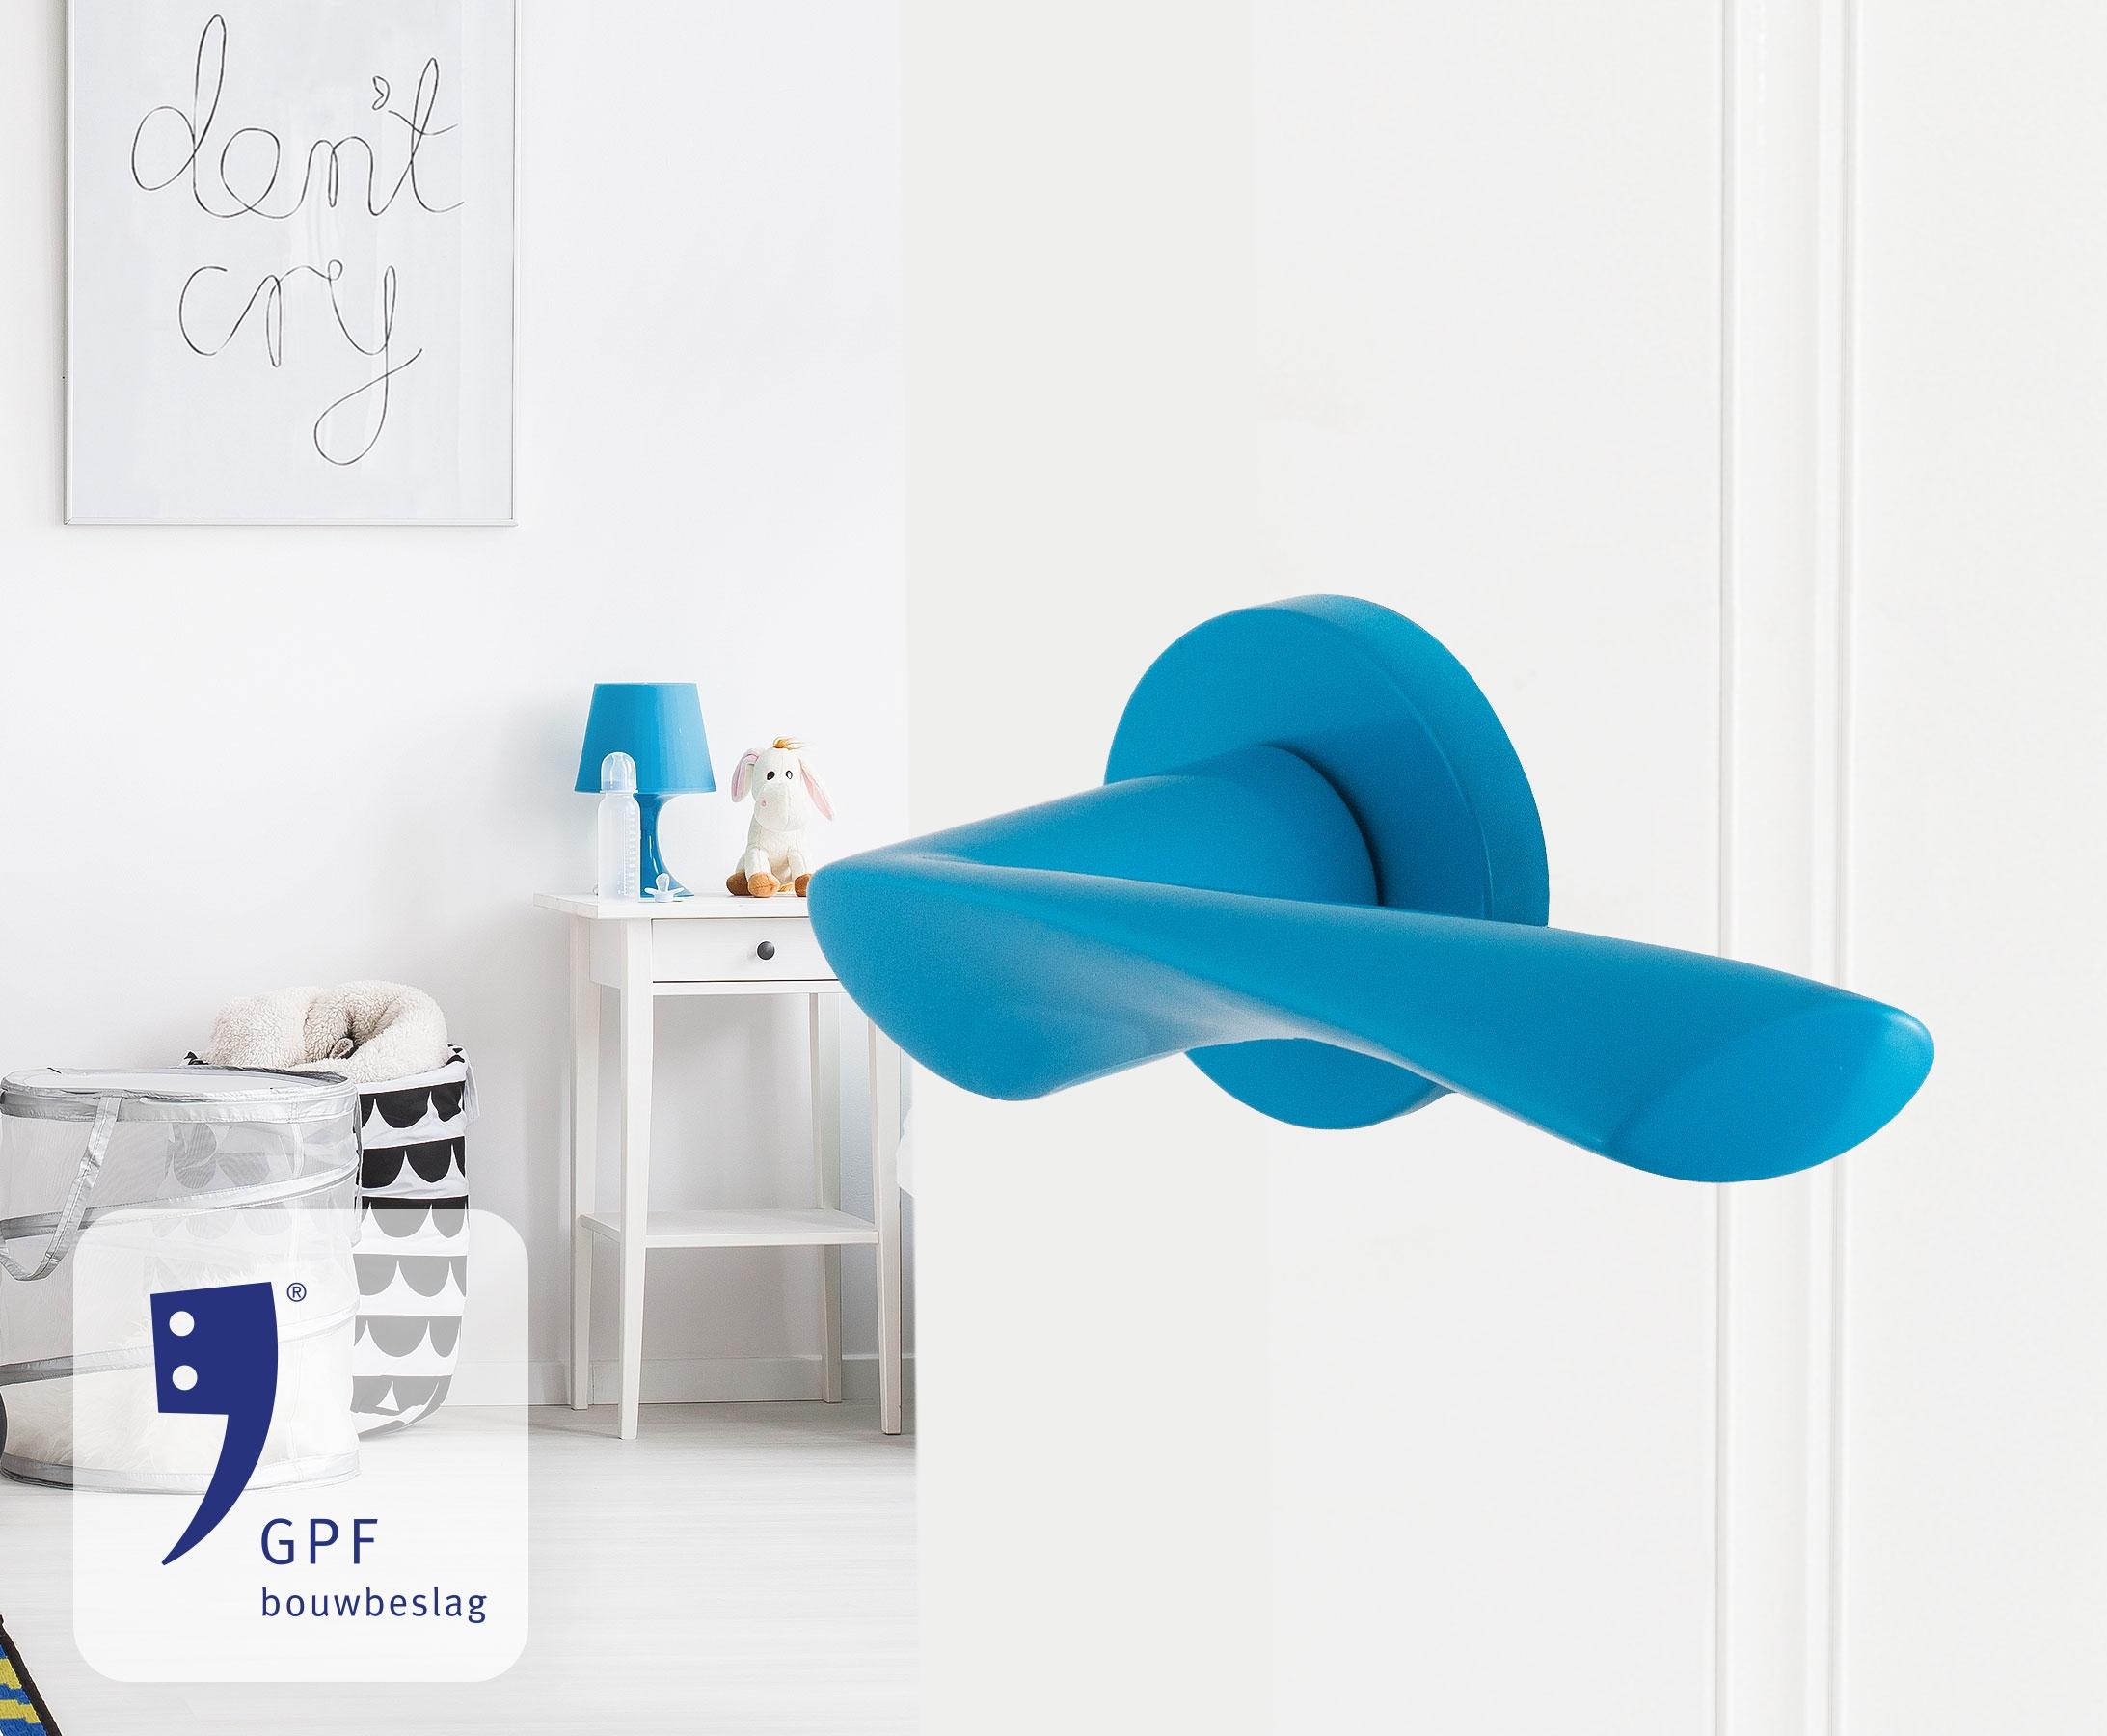 GPF bouwbeslag finish blauw